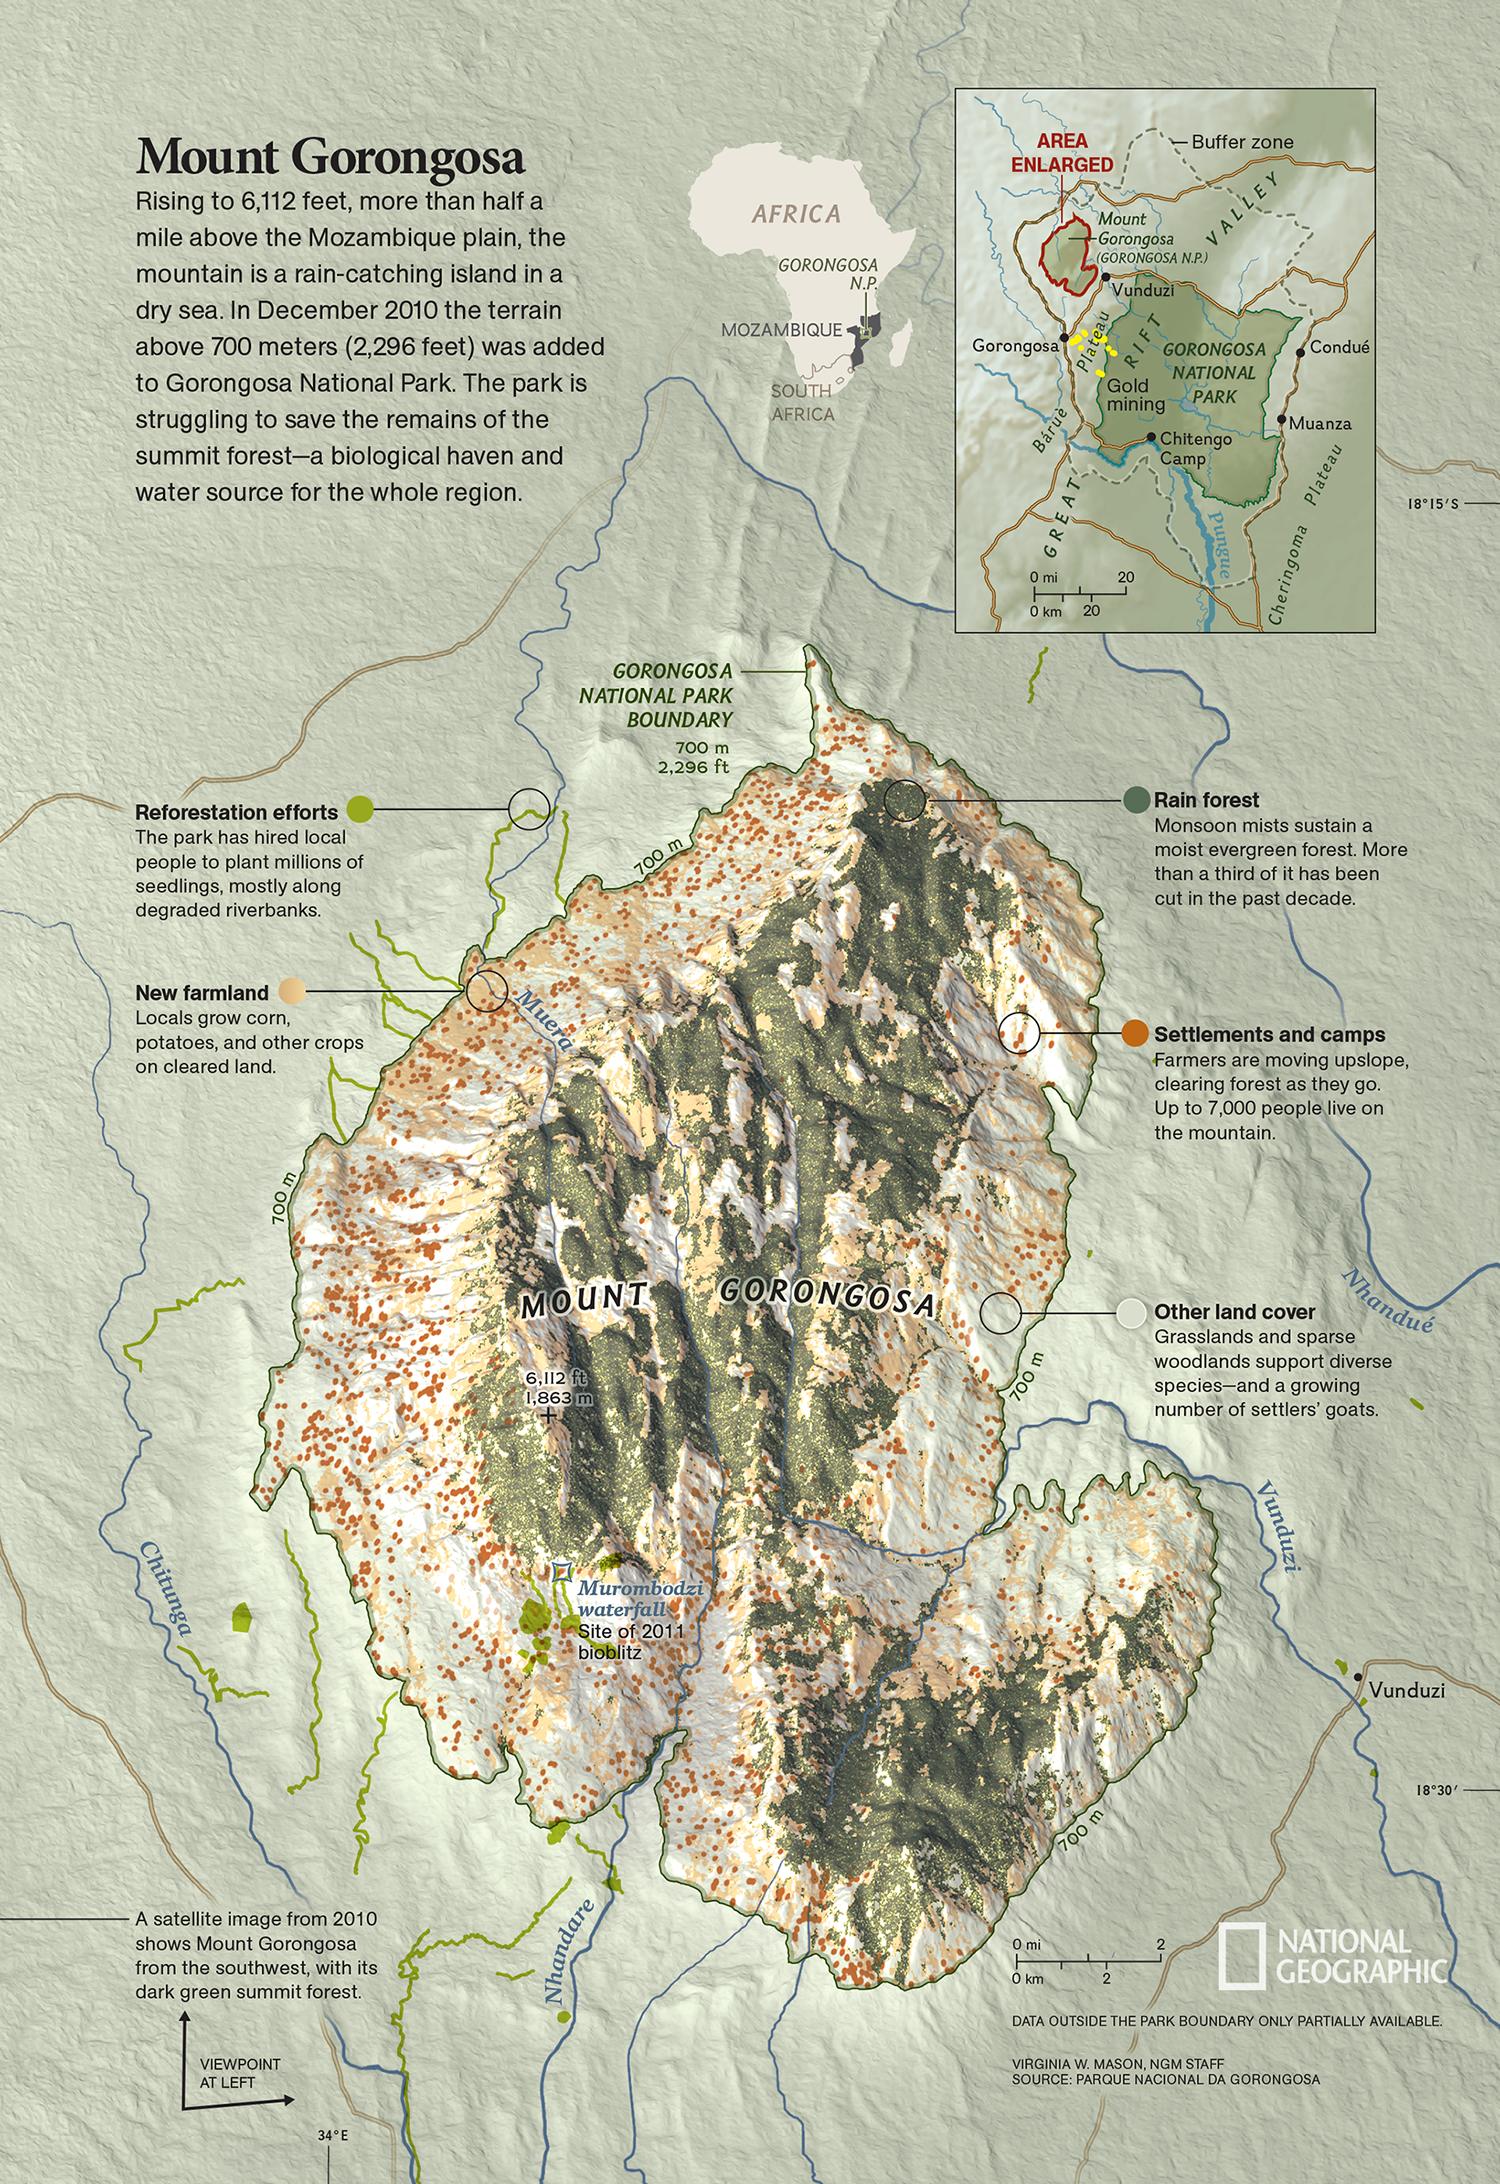 Mount Gorongosa